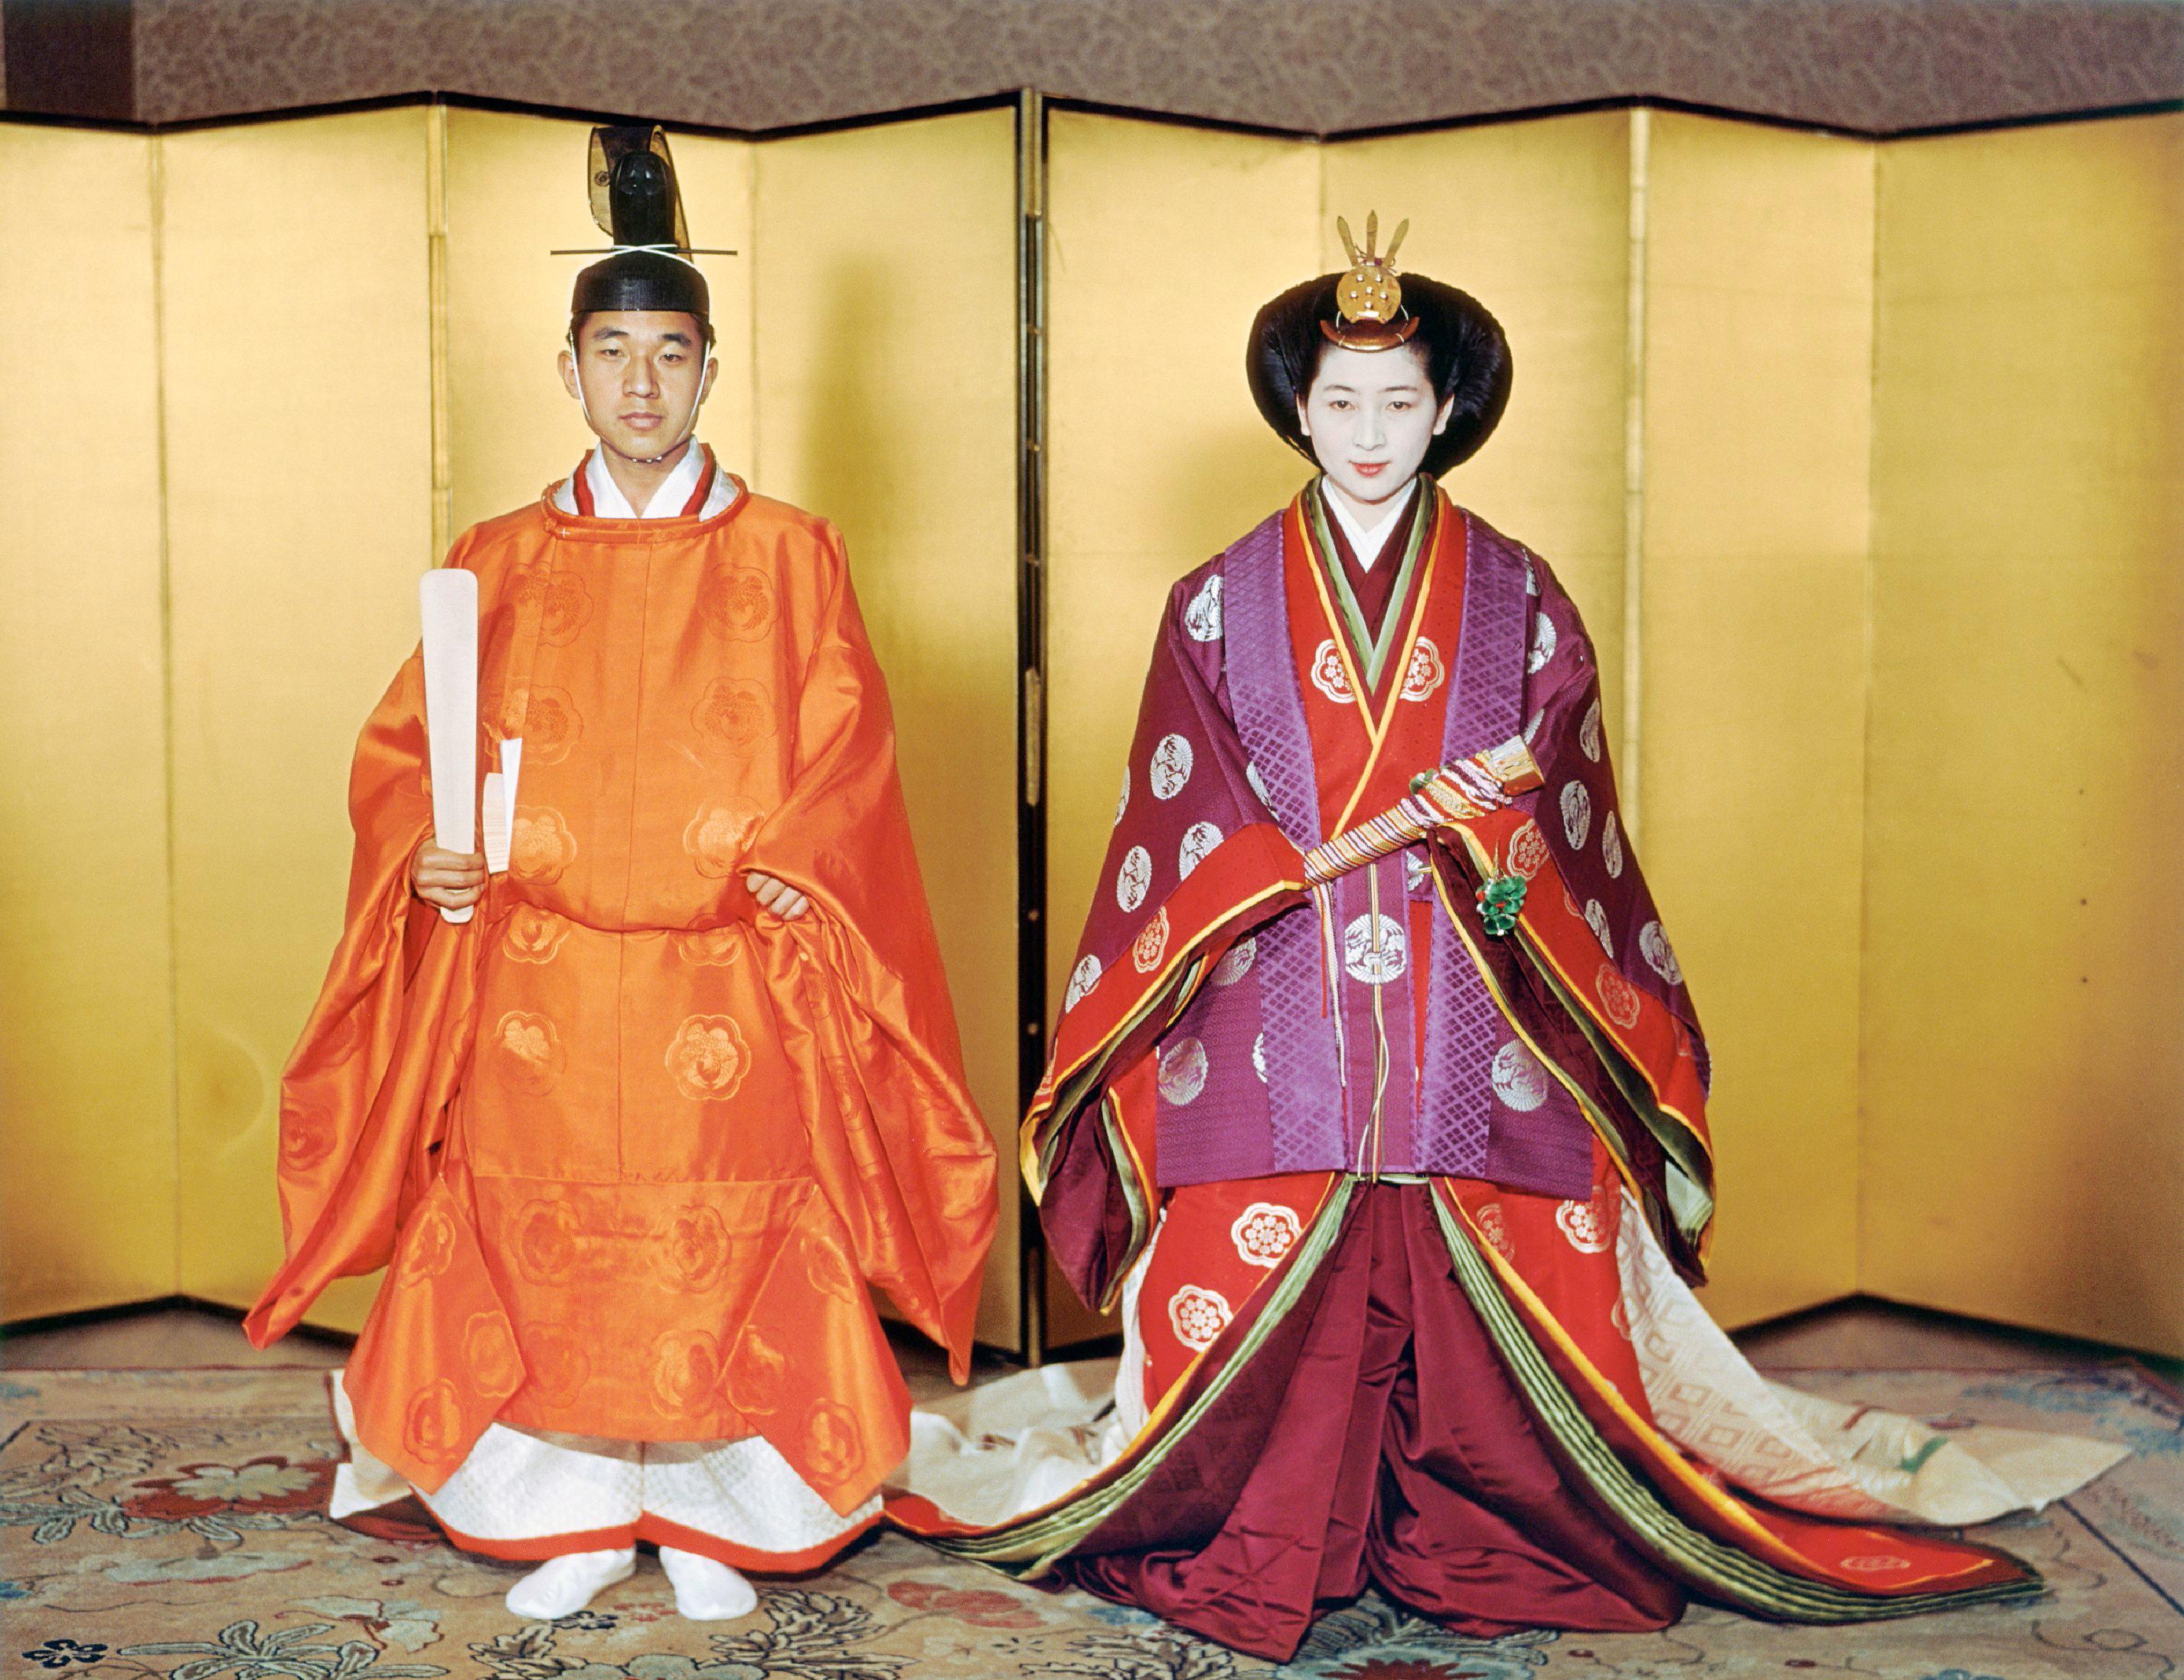 Japan S Ancient And Mysterious Royal Regalia Cnn Style